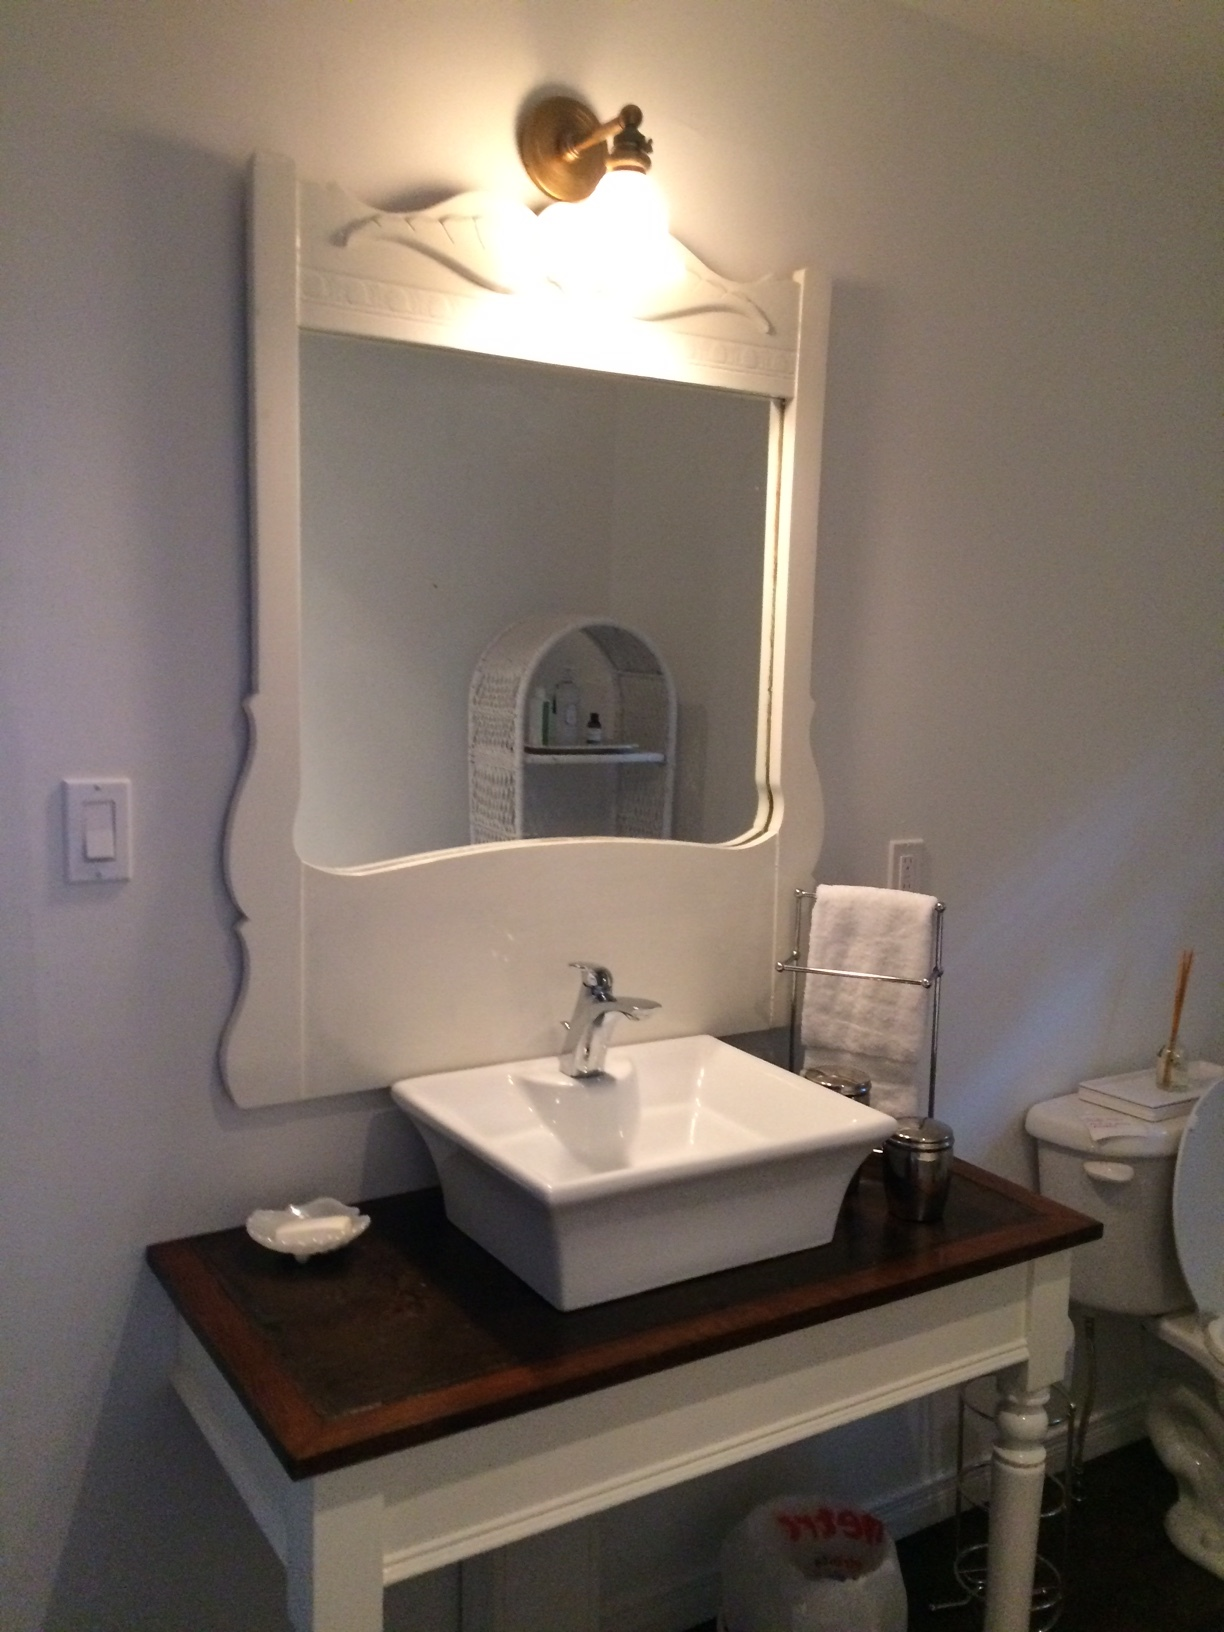 thelma lower bathroom 2.jpg